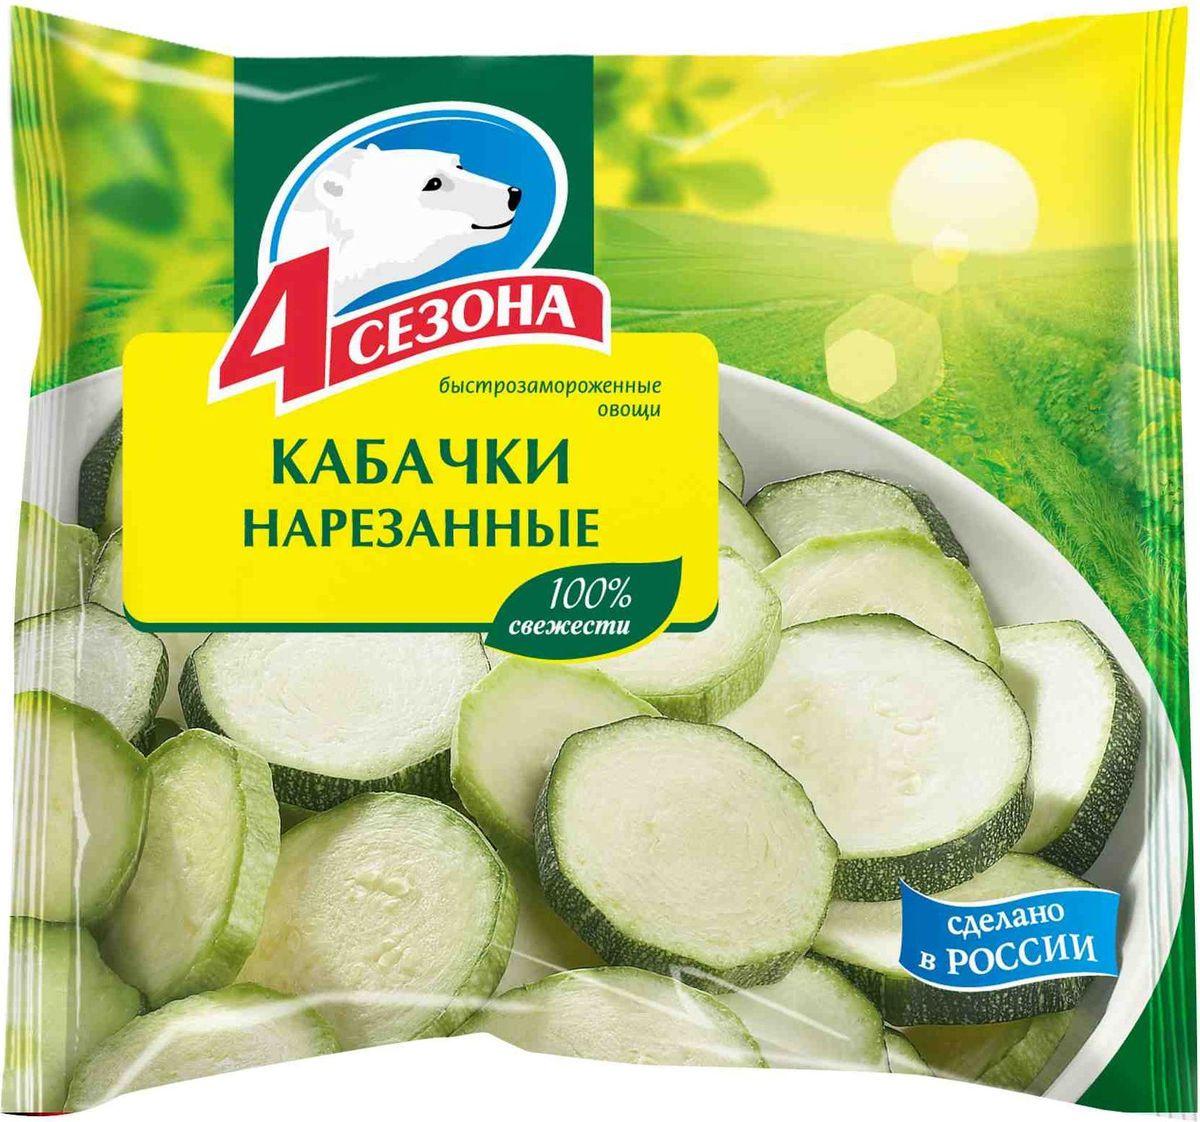 4 Сезона Кабачки нарезанные, 400 г #1